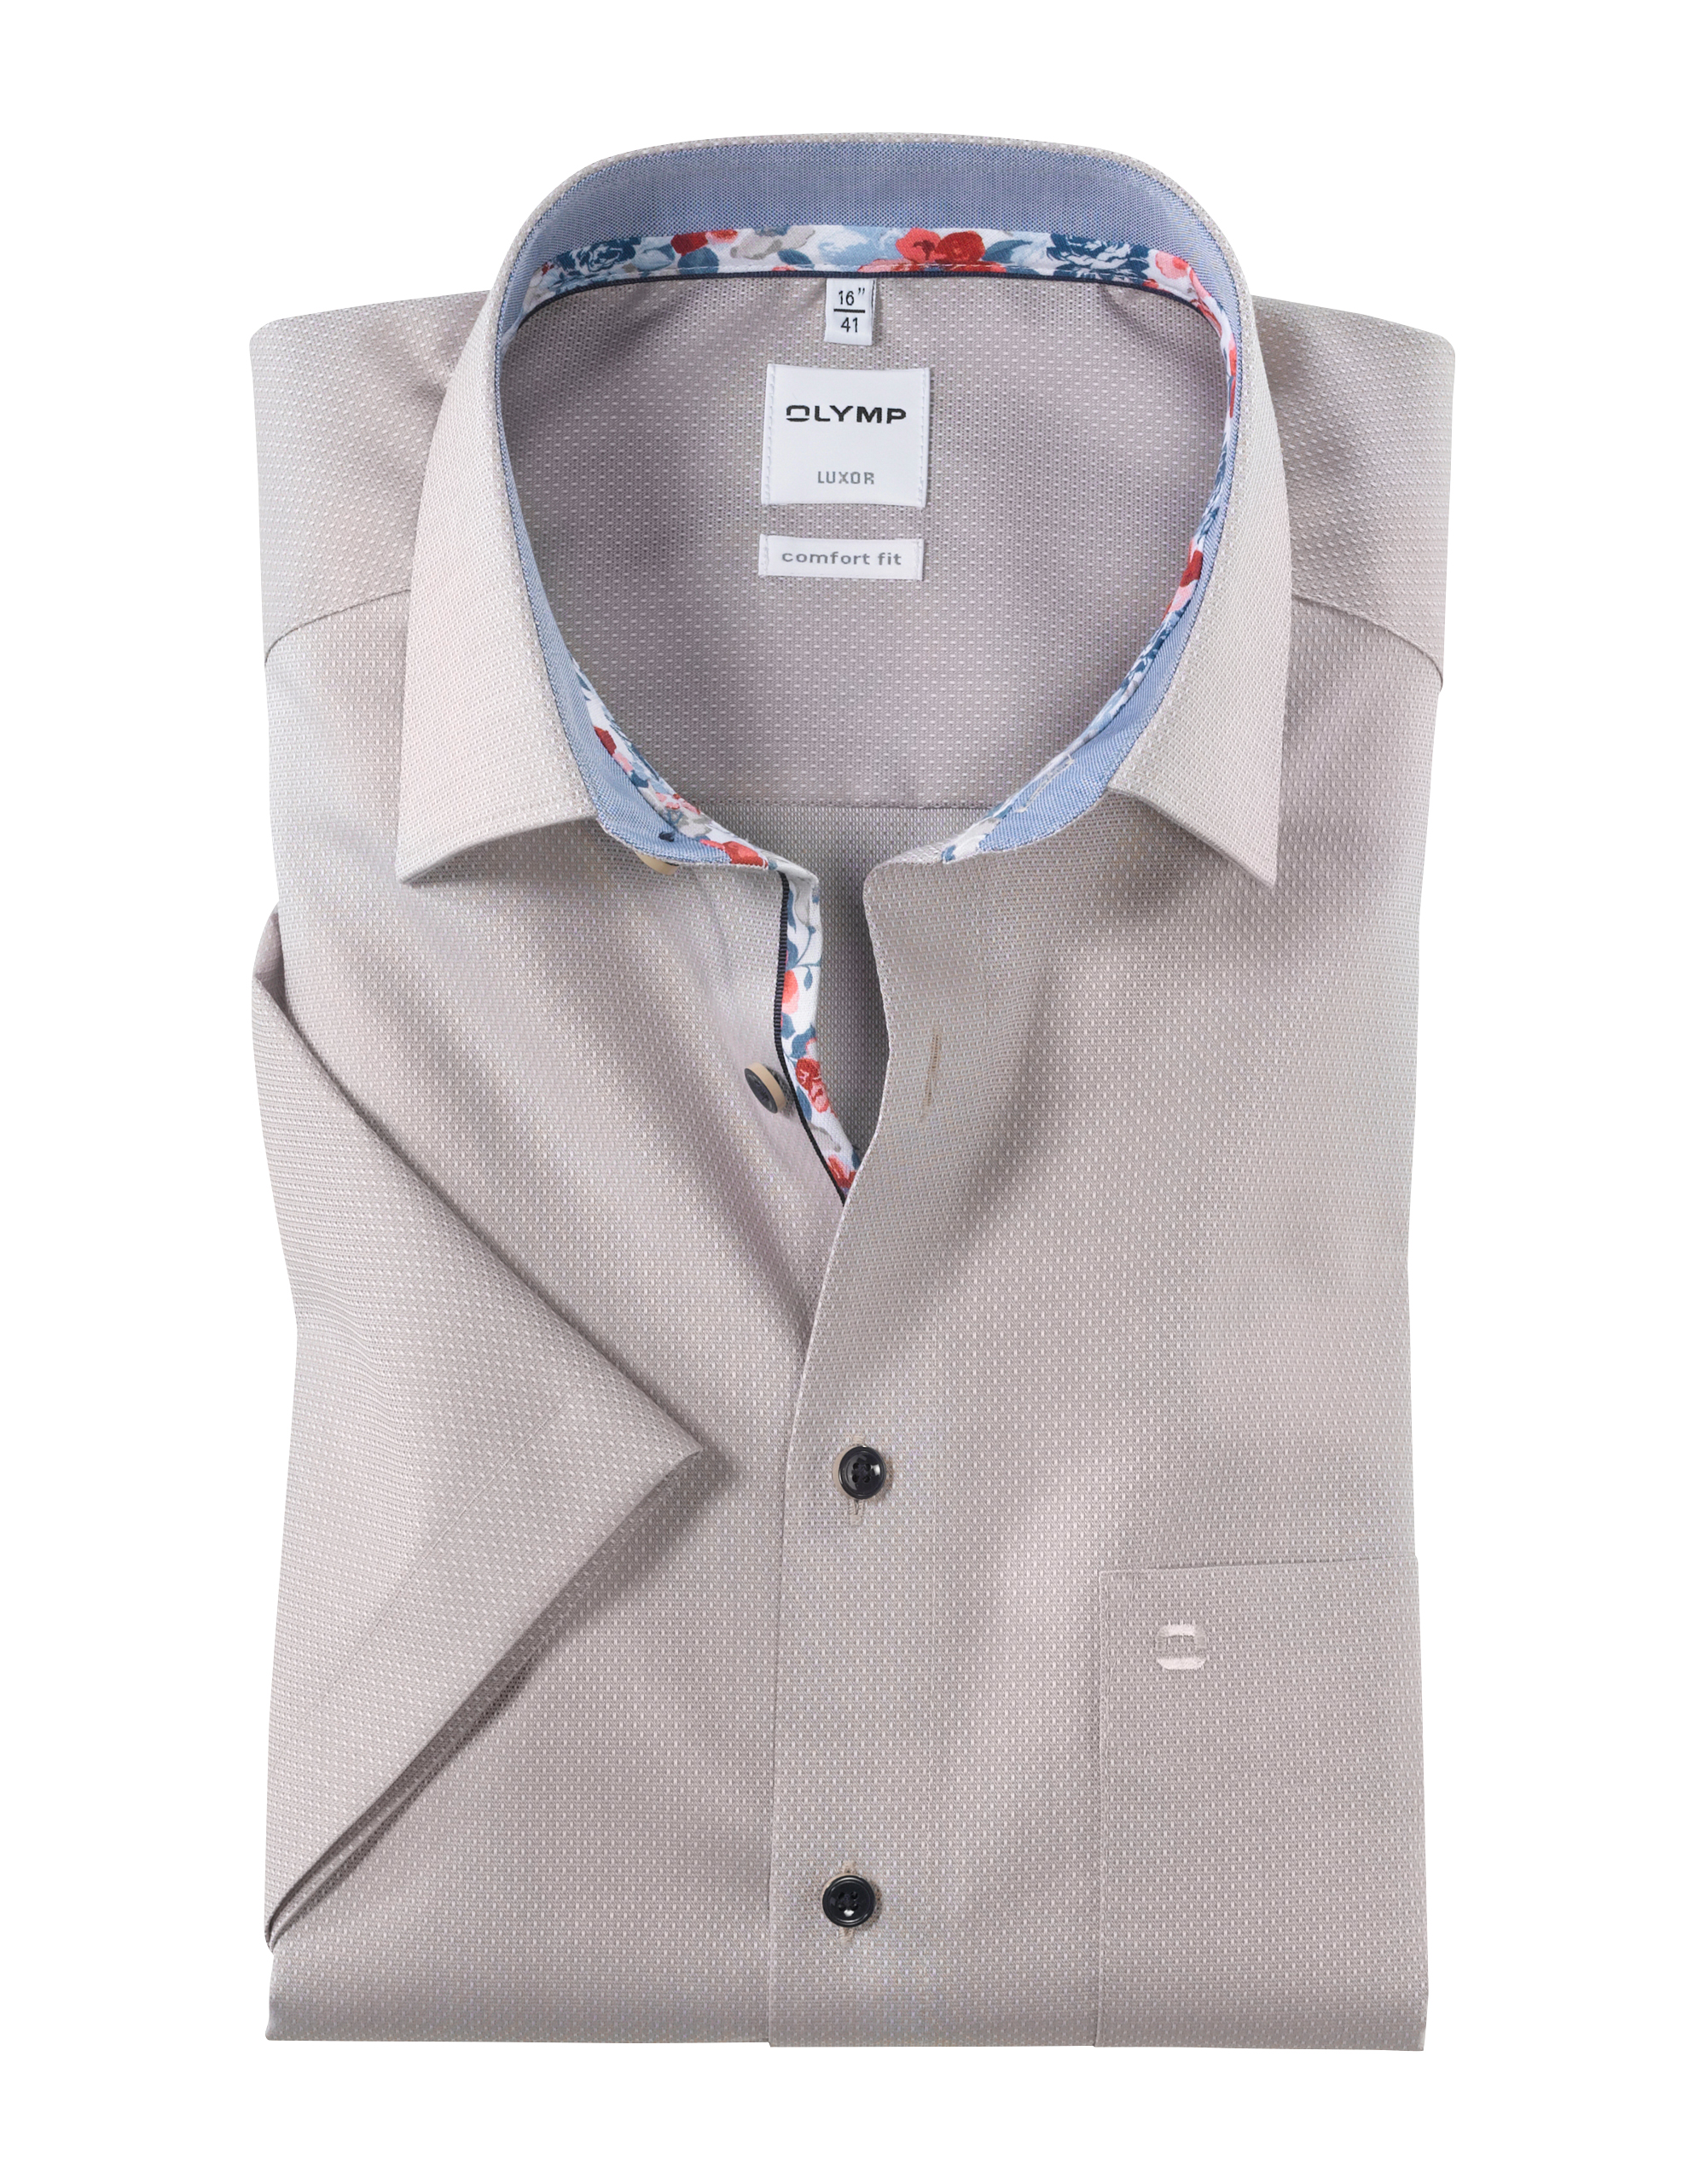 OLYMP Luxor Kurzarmhemd, comfort fit, New Kent, Nougat, 50 | Bekleidung > Hemden > Sonstige Hemden | Nougat | Baumwolle | OLYMP Luxor